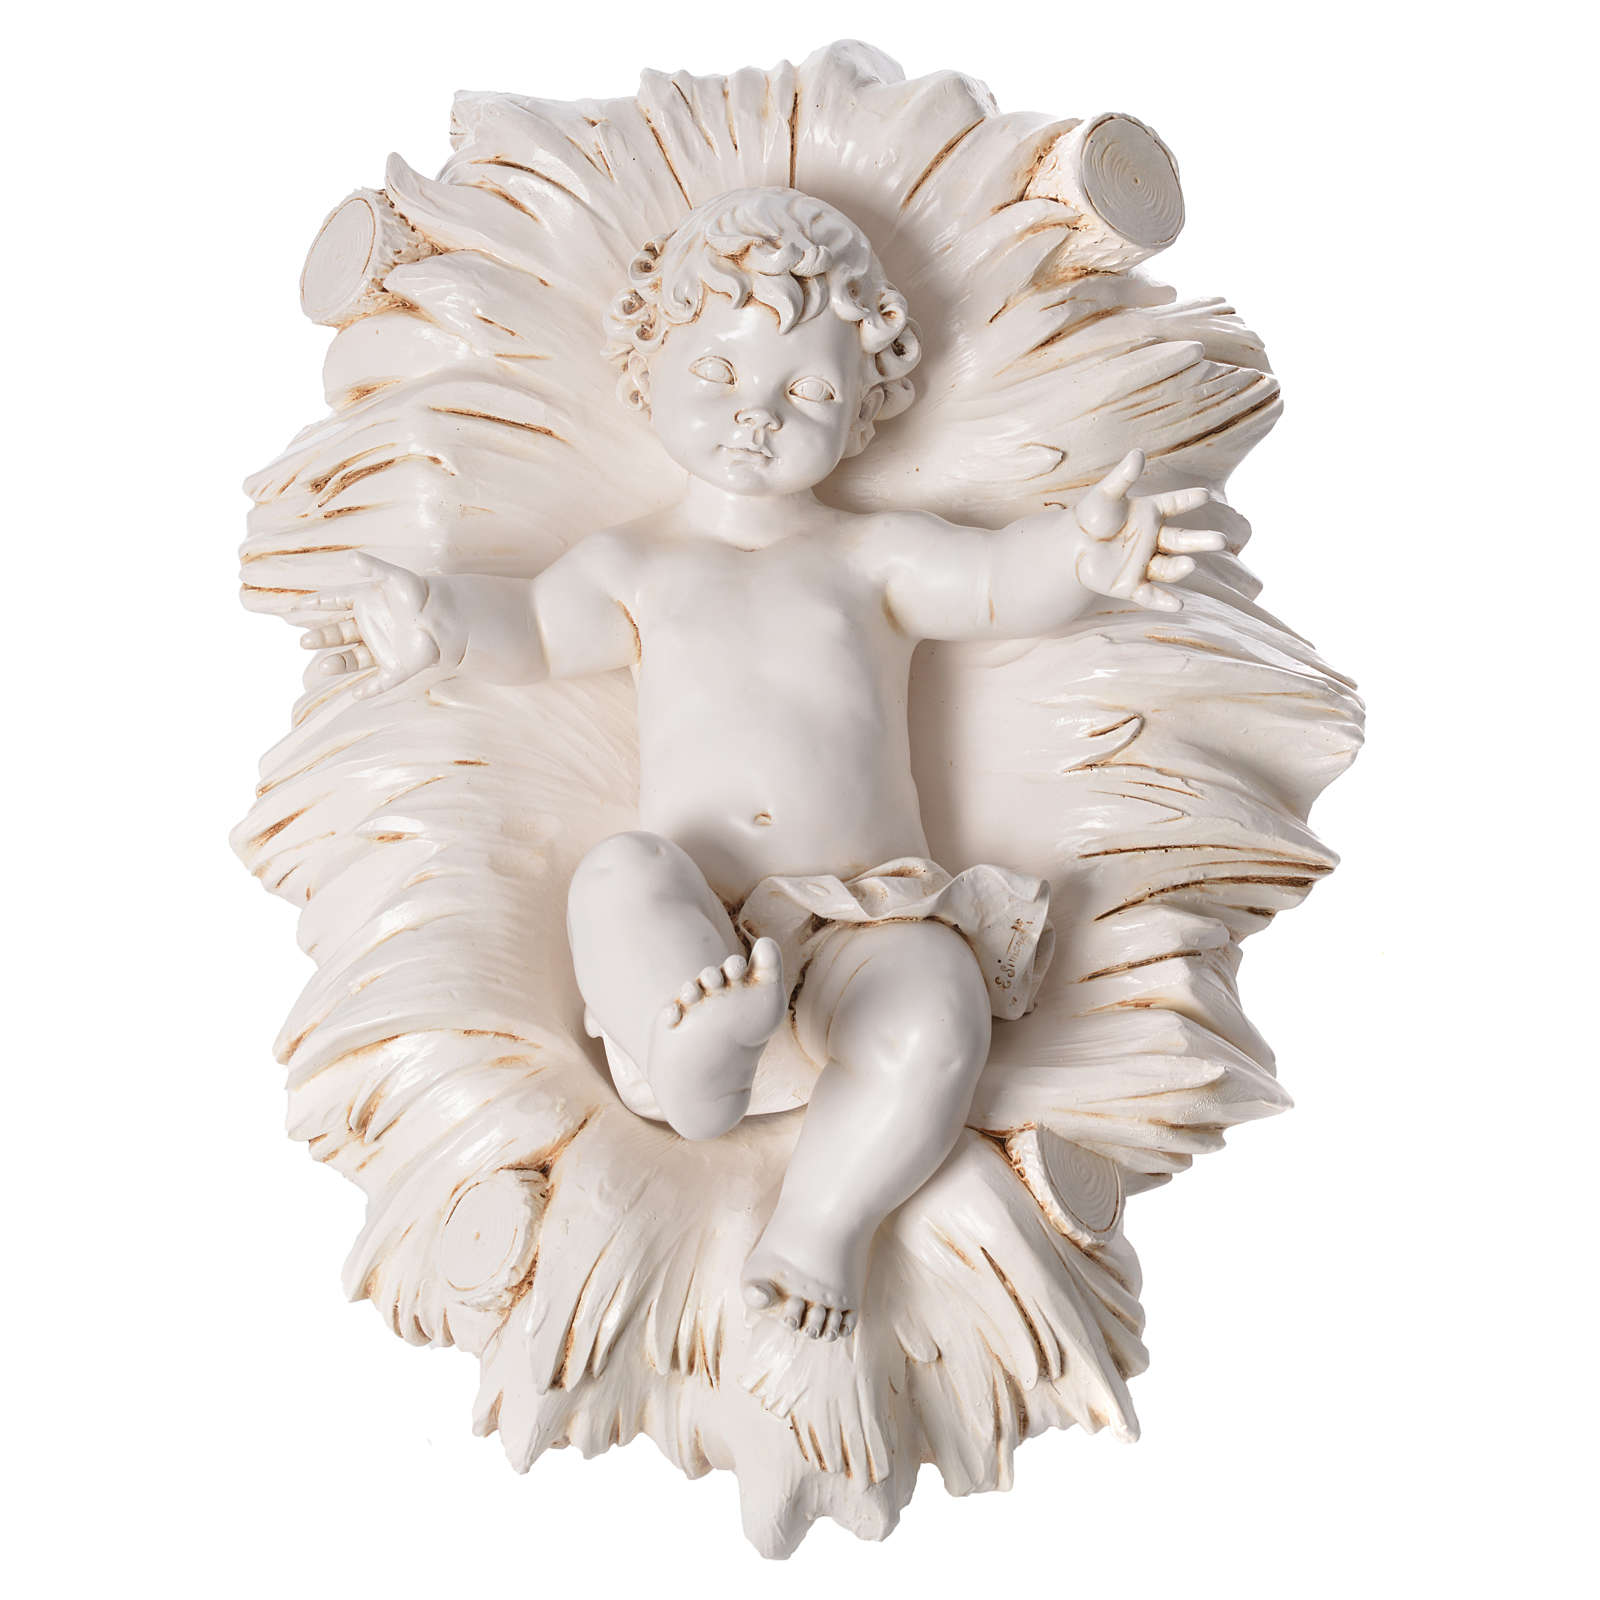 Natività 125 cm resina Fontanini fin. Siena 3